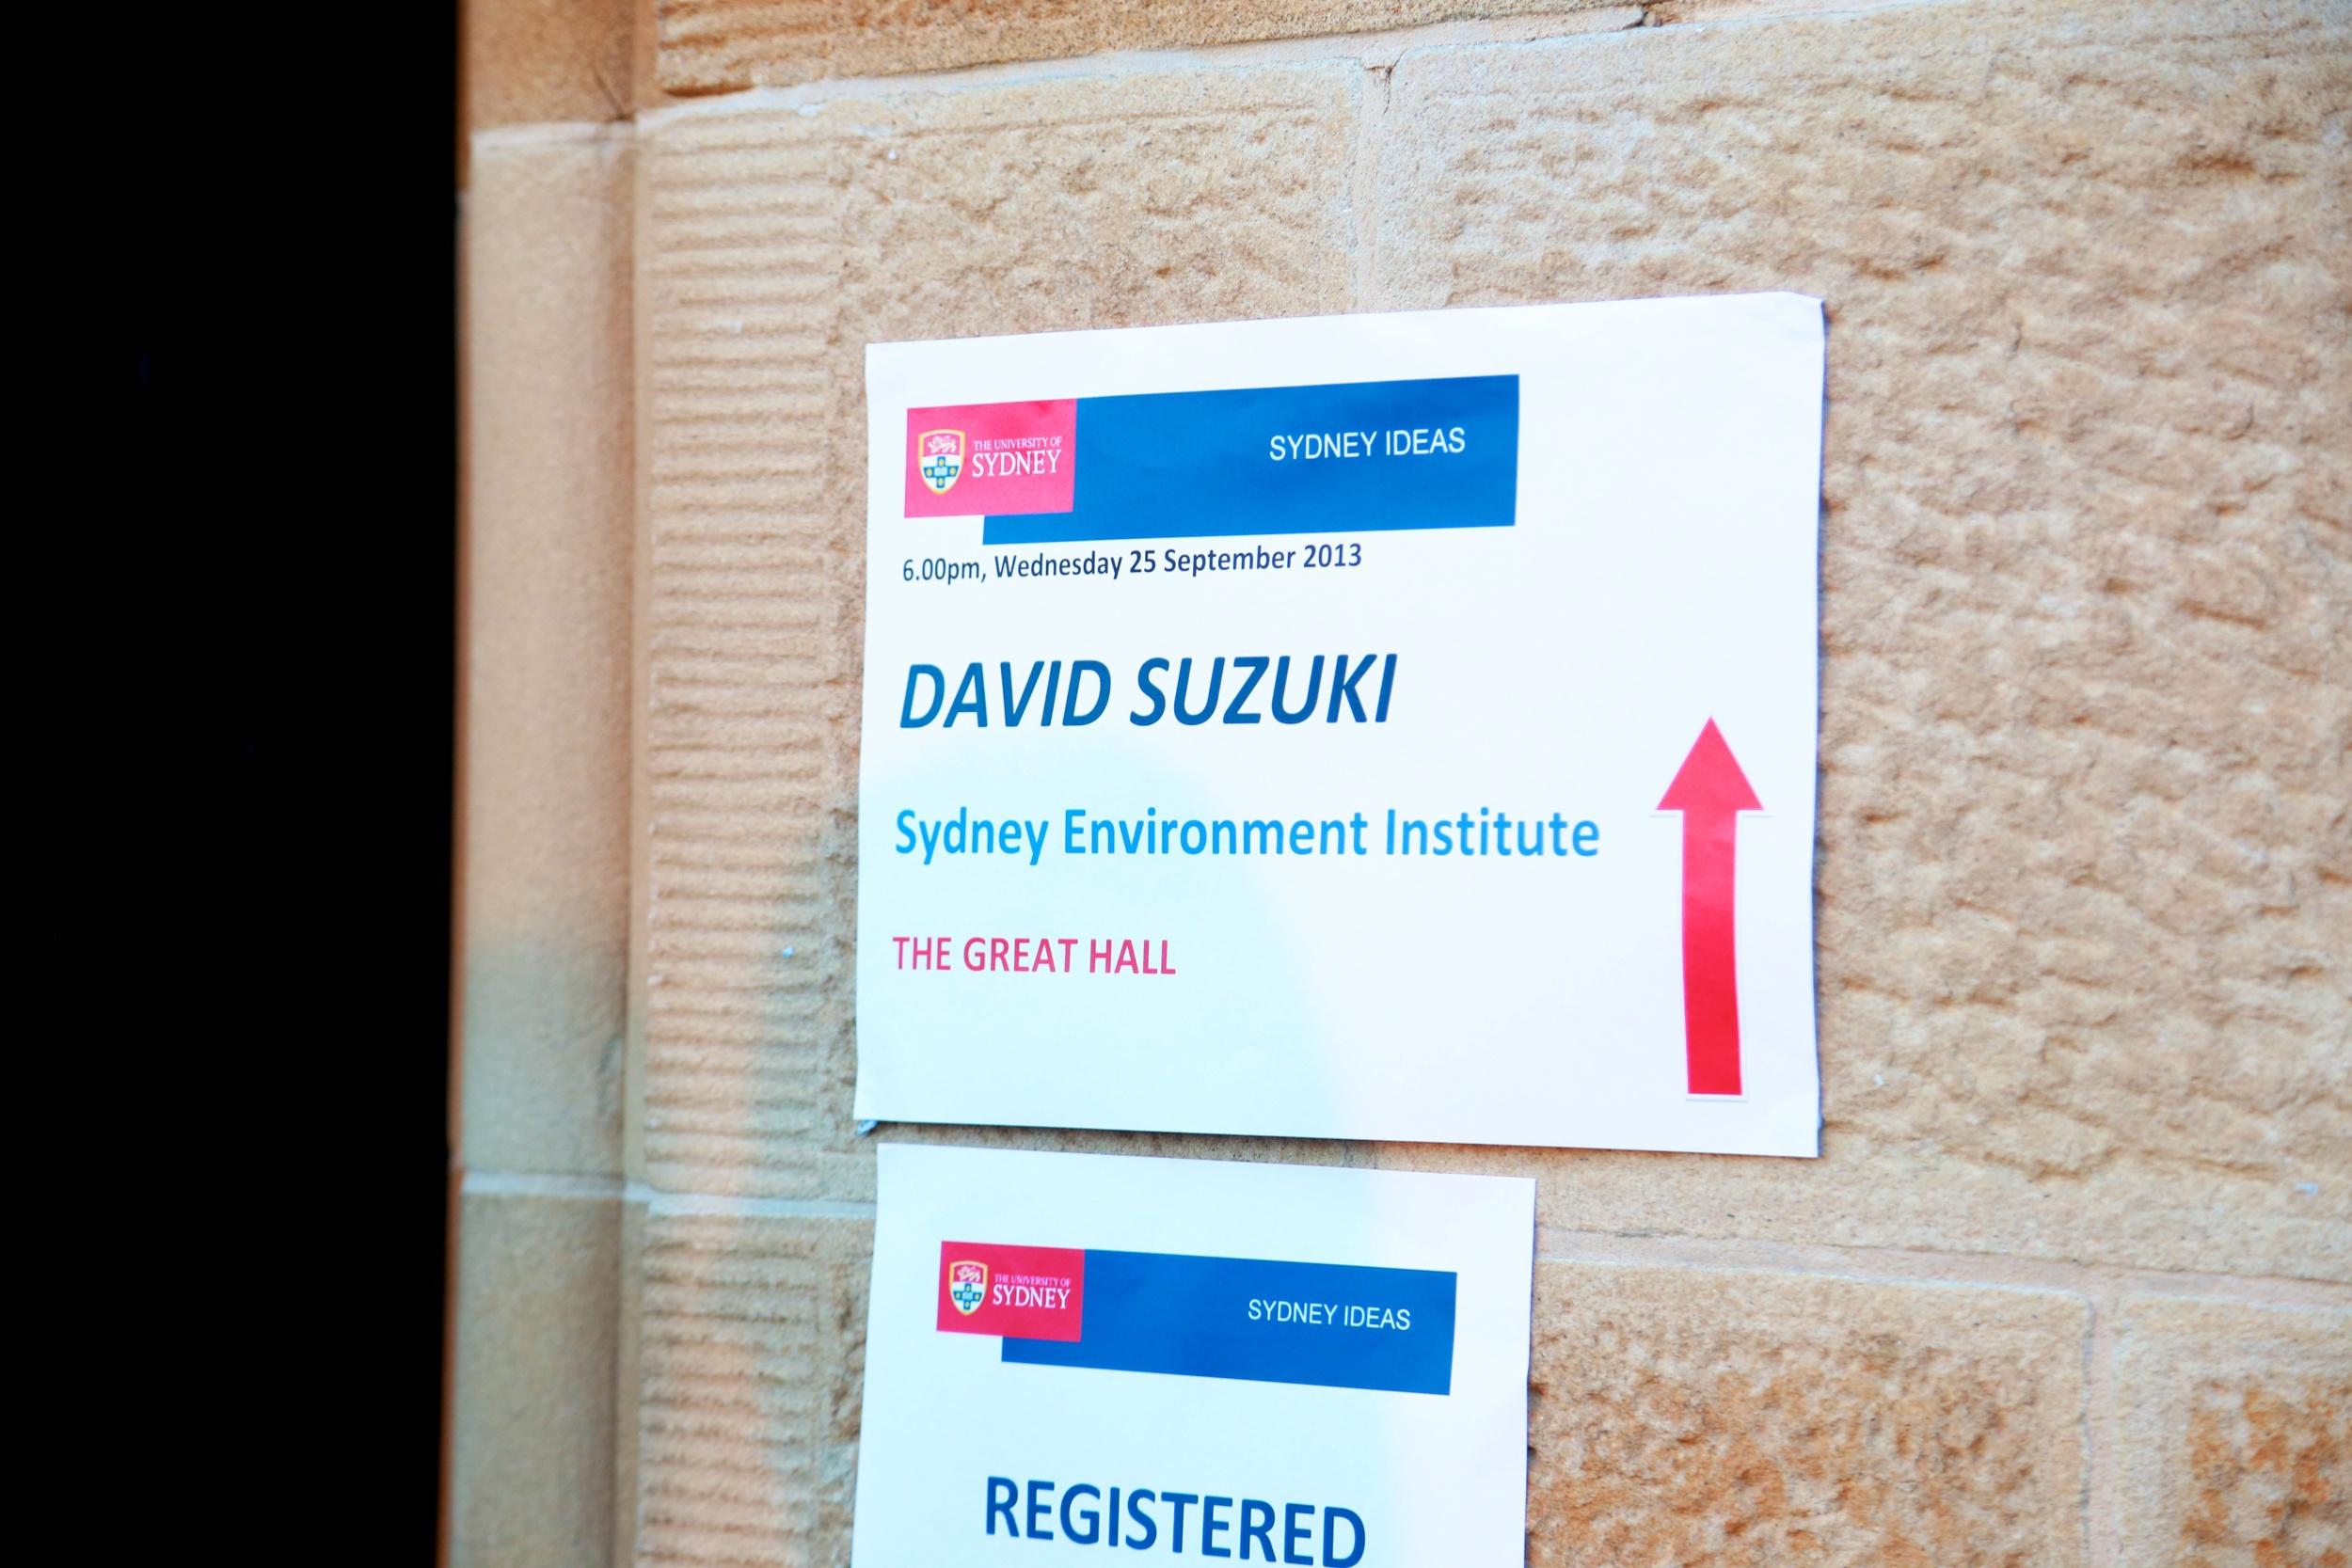 David Suzuki 009.jpg